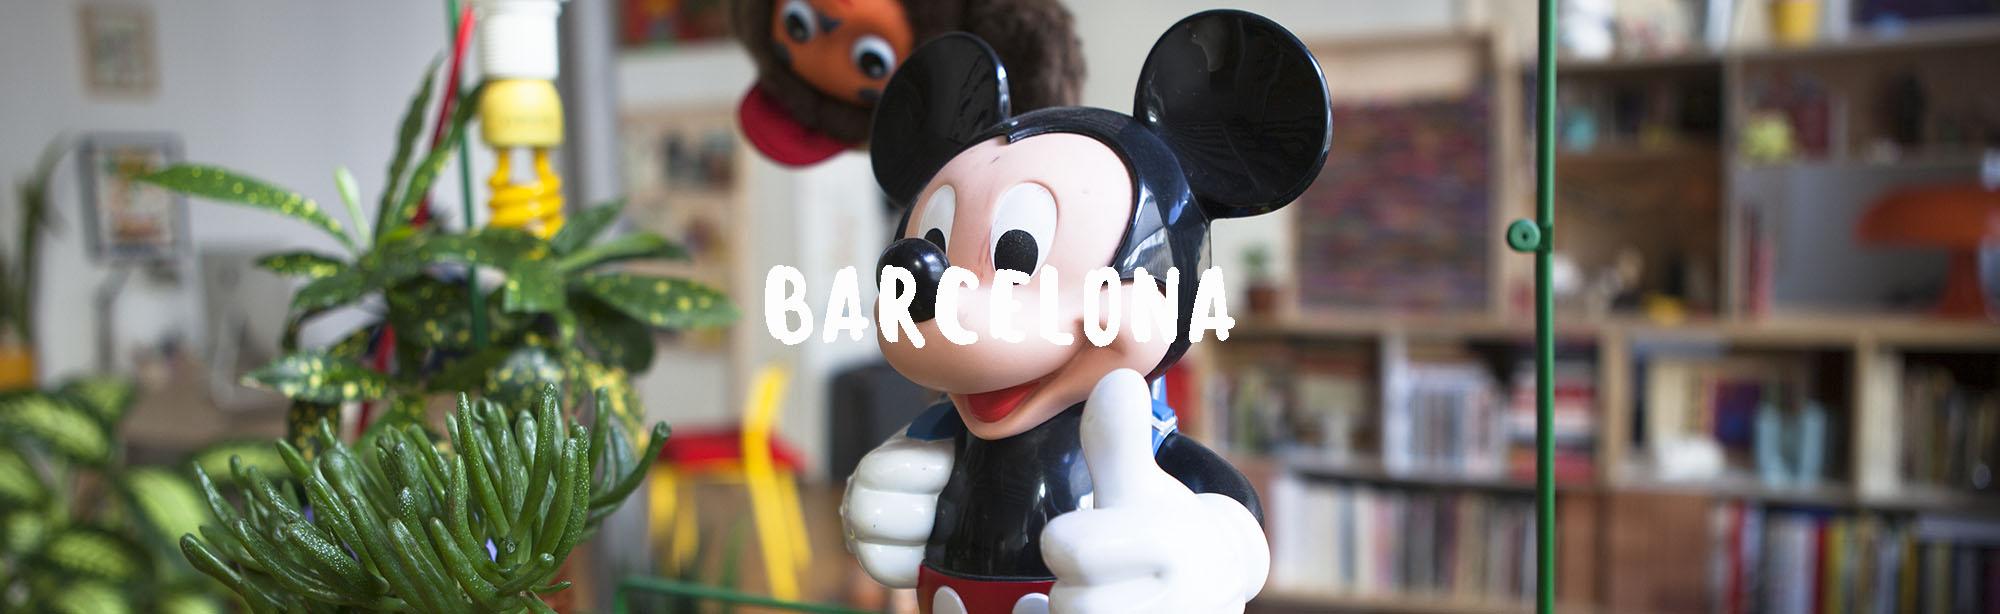 tapa Barcelona 2.jpg